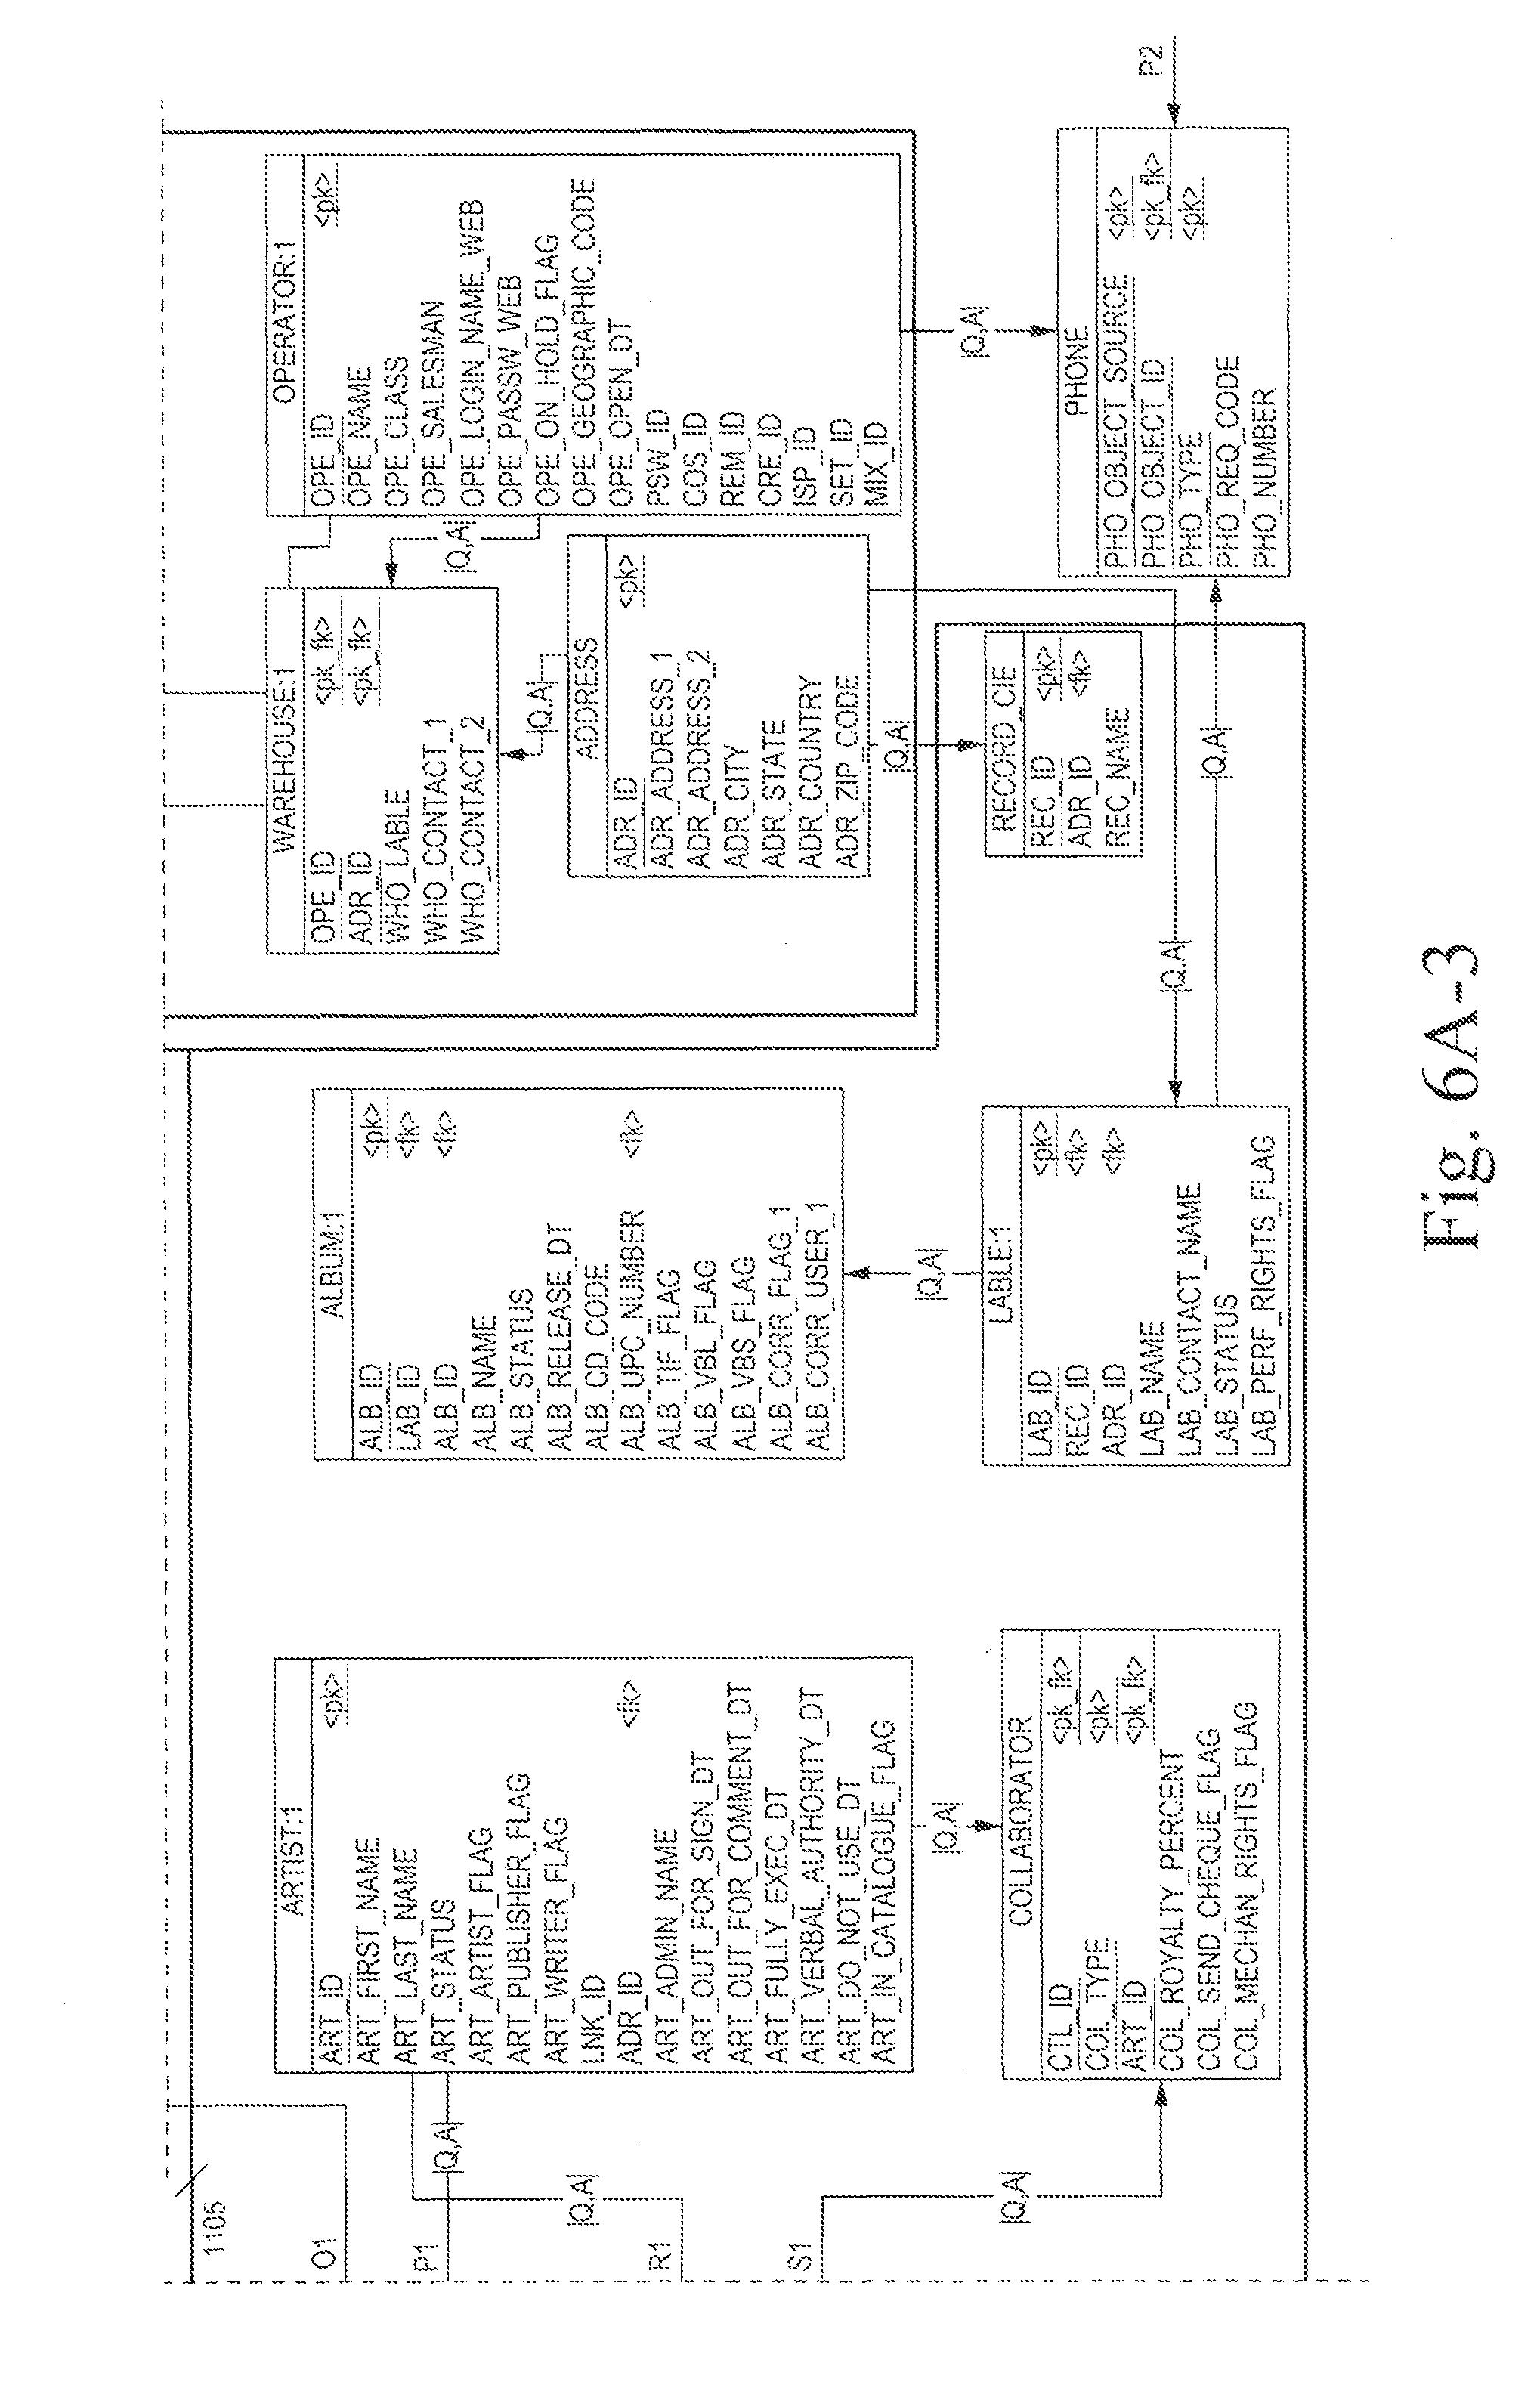 Patent US 9,288,529 B2